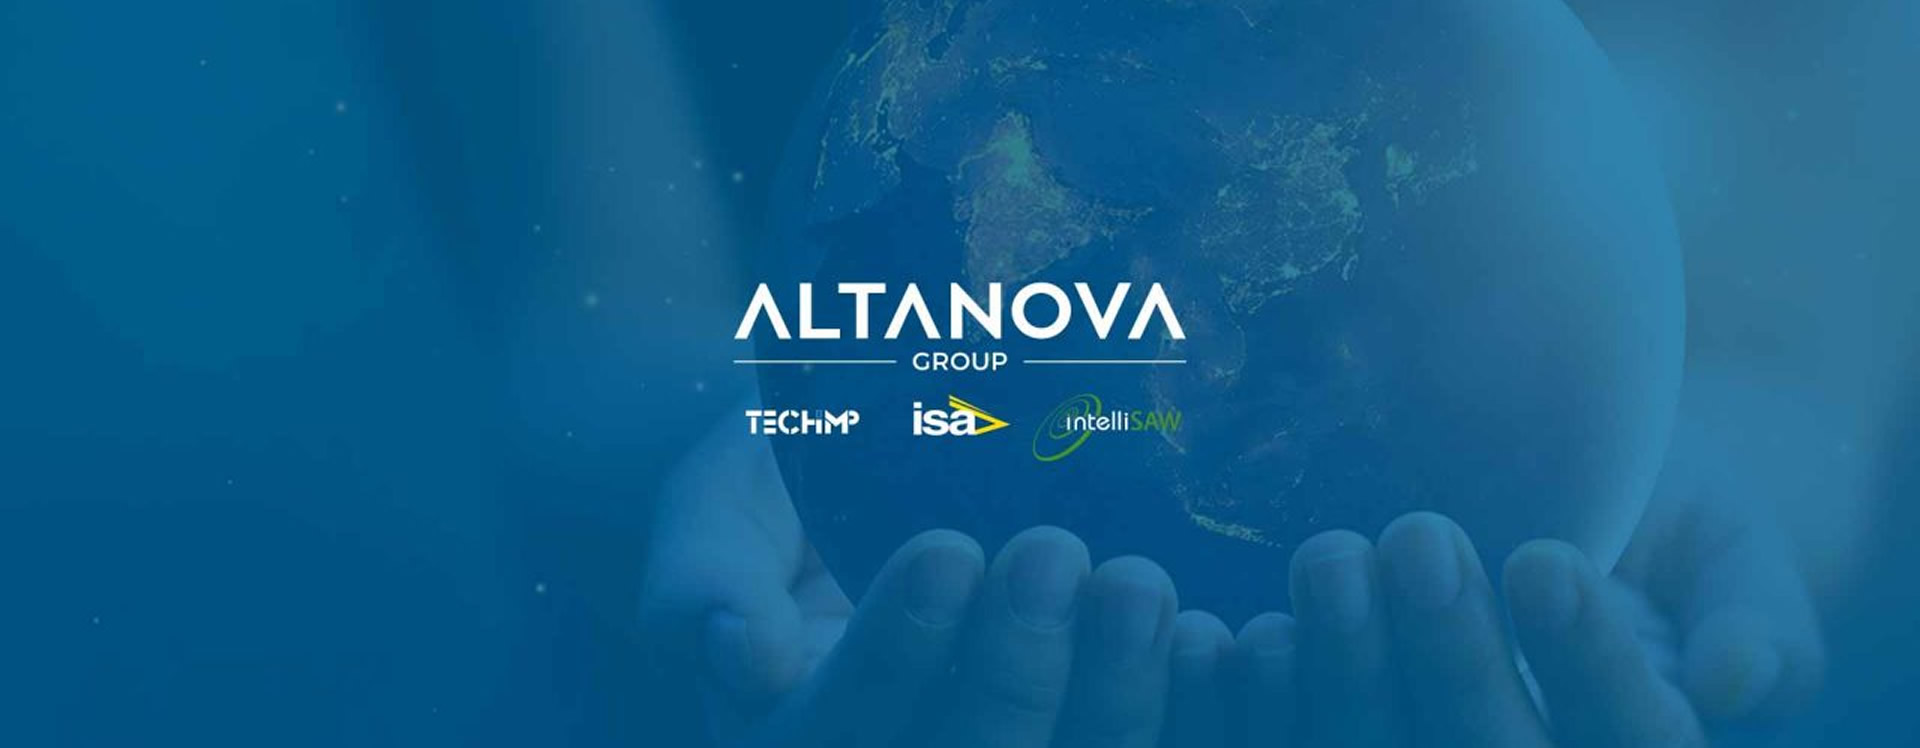 Digital marketing Business automation Altanova Group